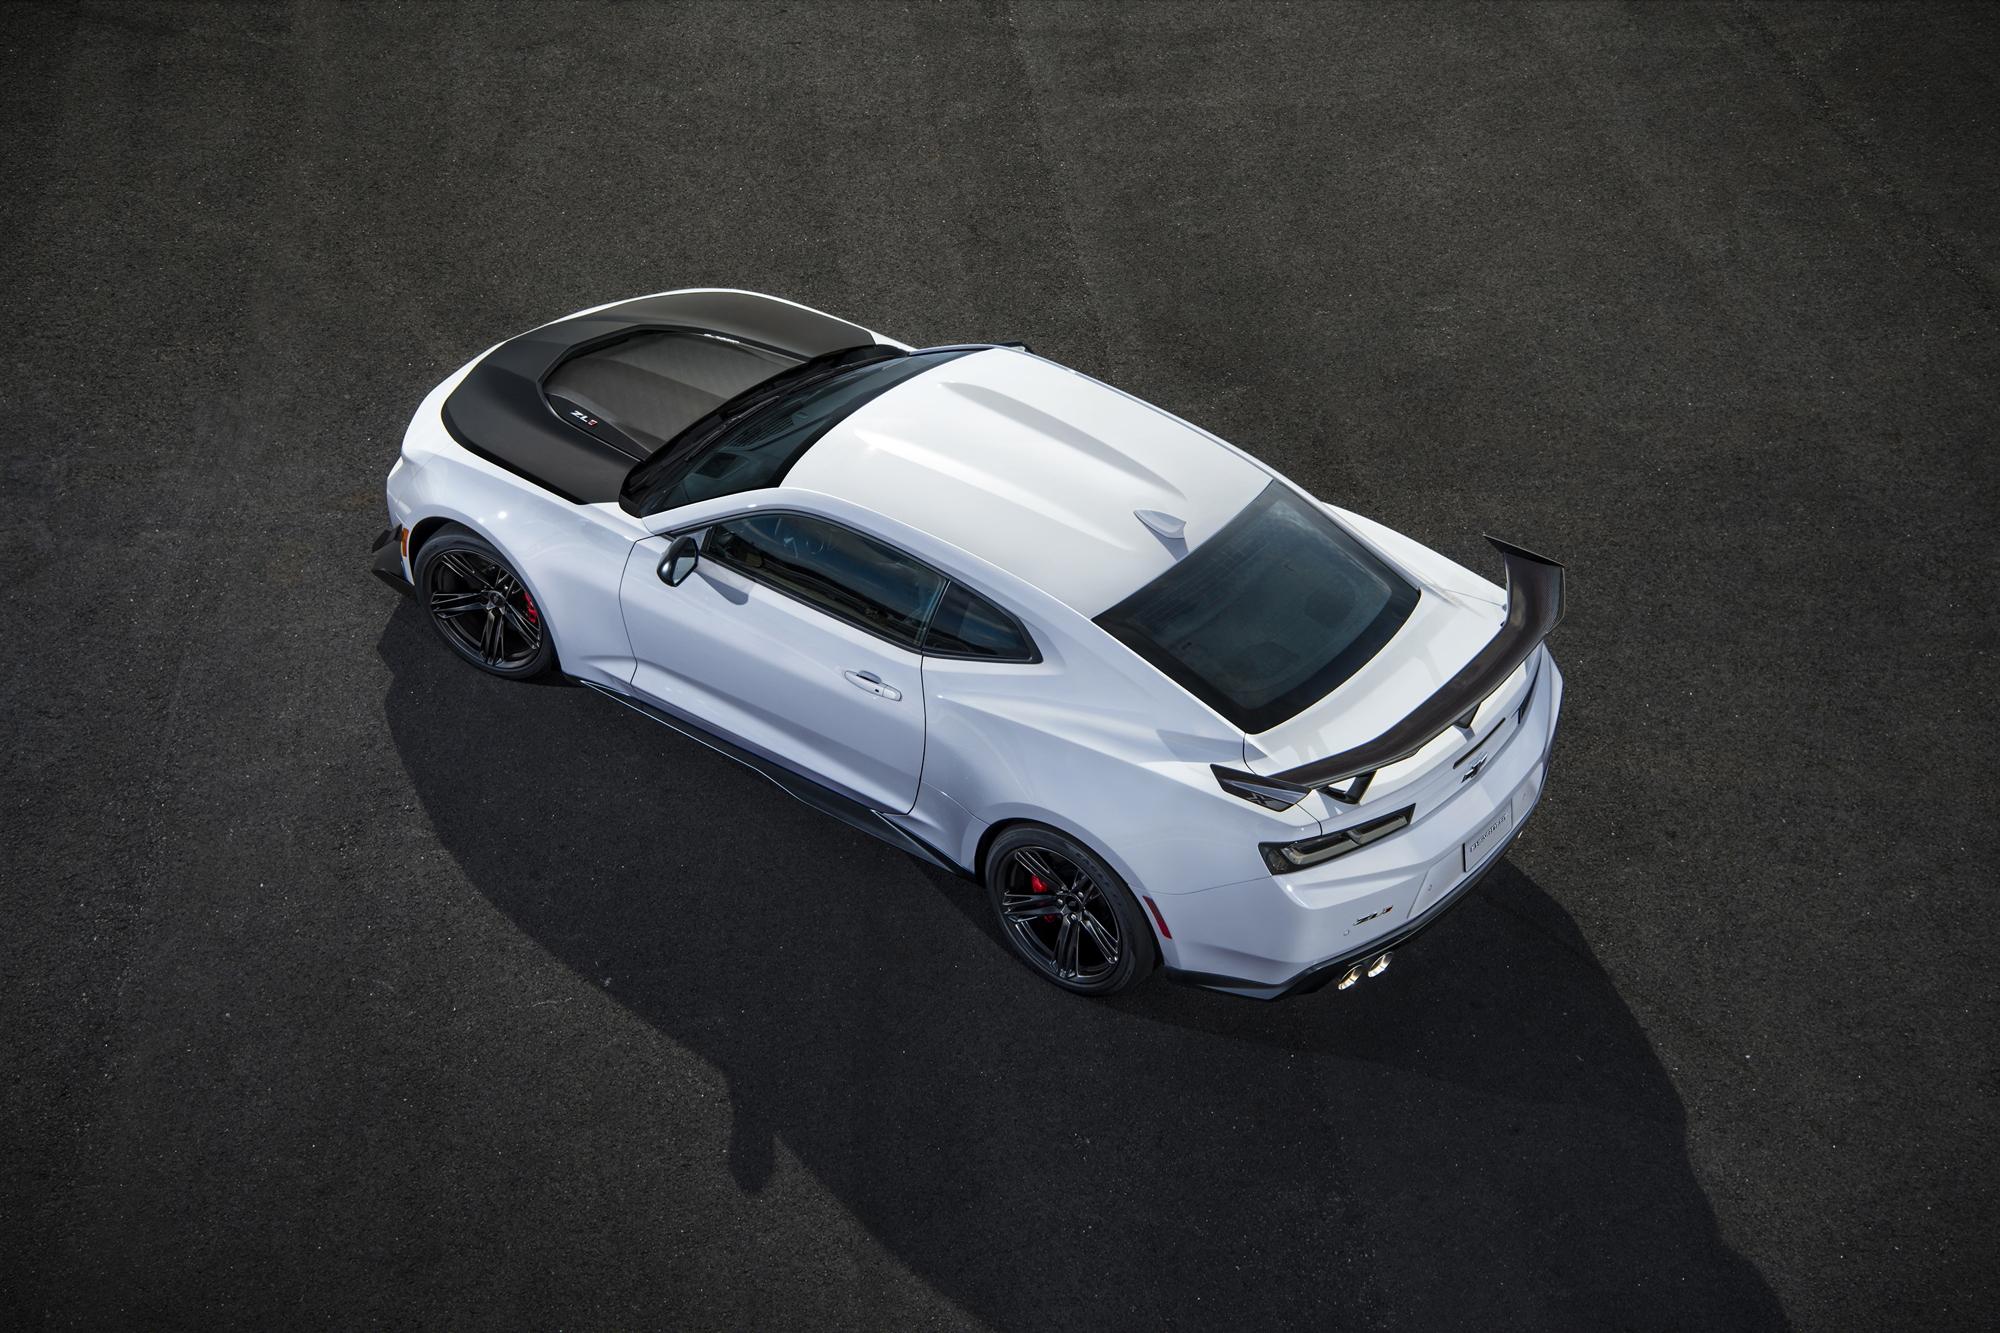 2018 Chevrolet Camaro ZL1 1LE profile